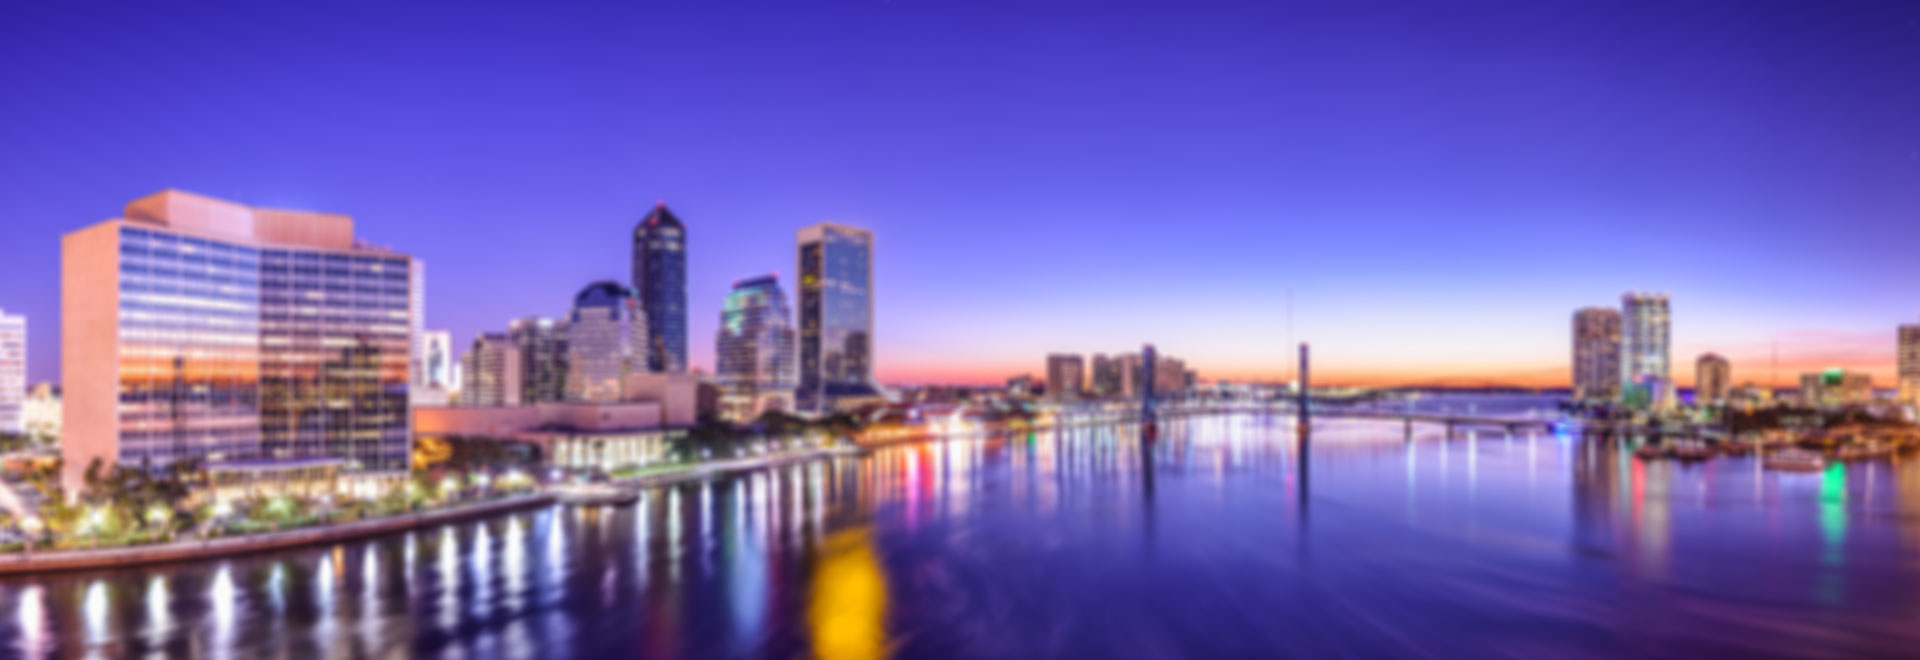 The Future of Jacksonville